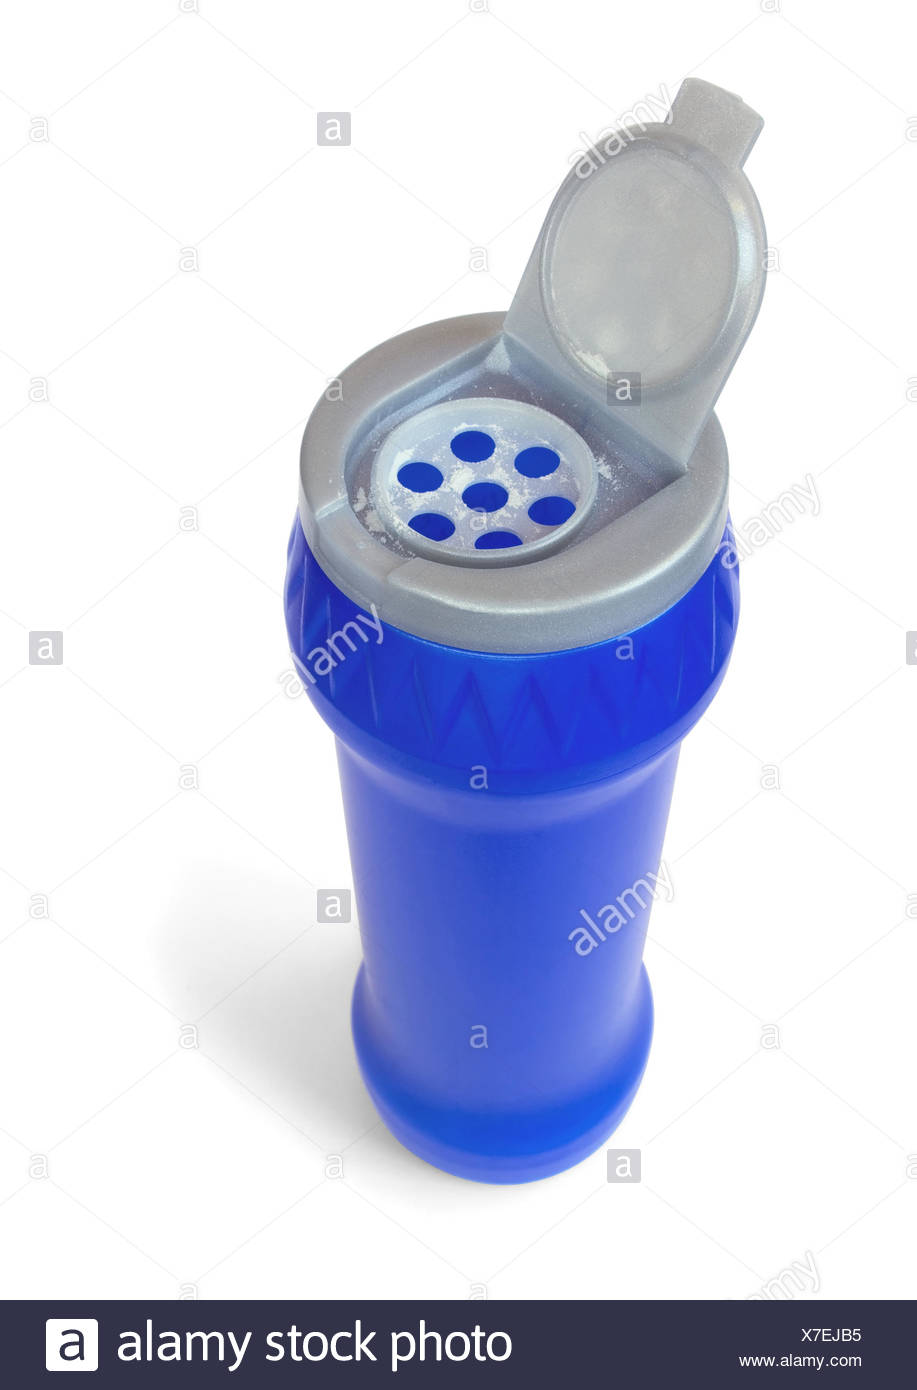 bottle of detergent powder - Stock Image